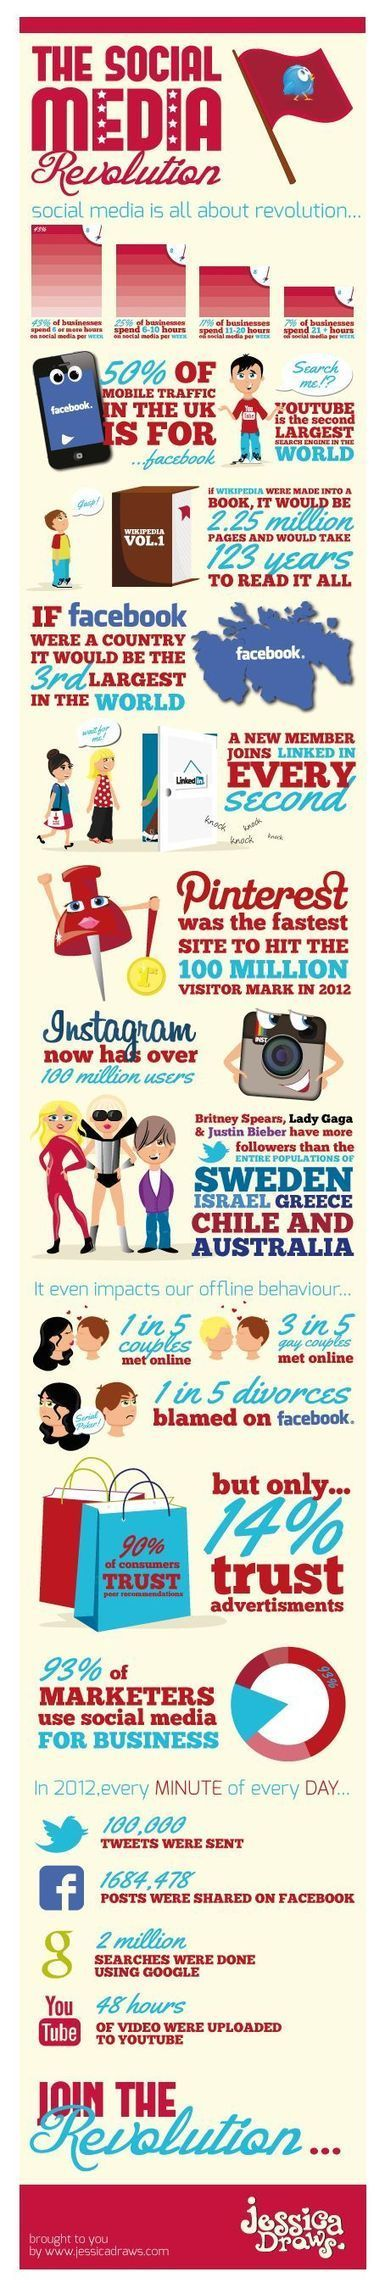 Fun facts about #socialmedia